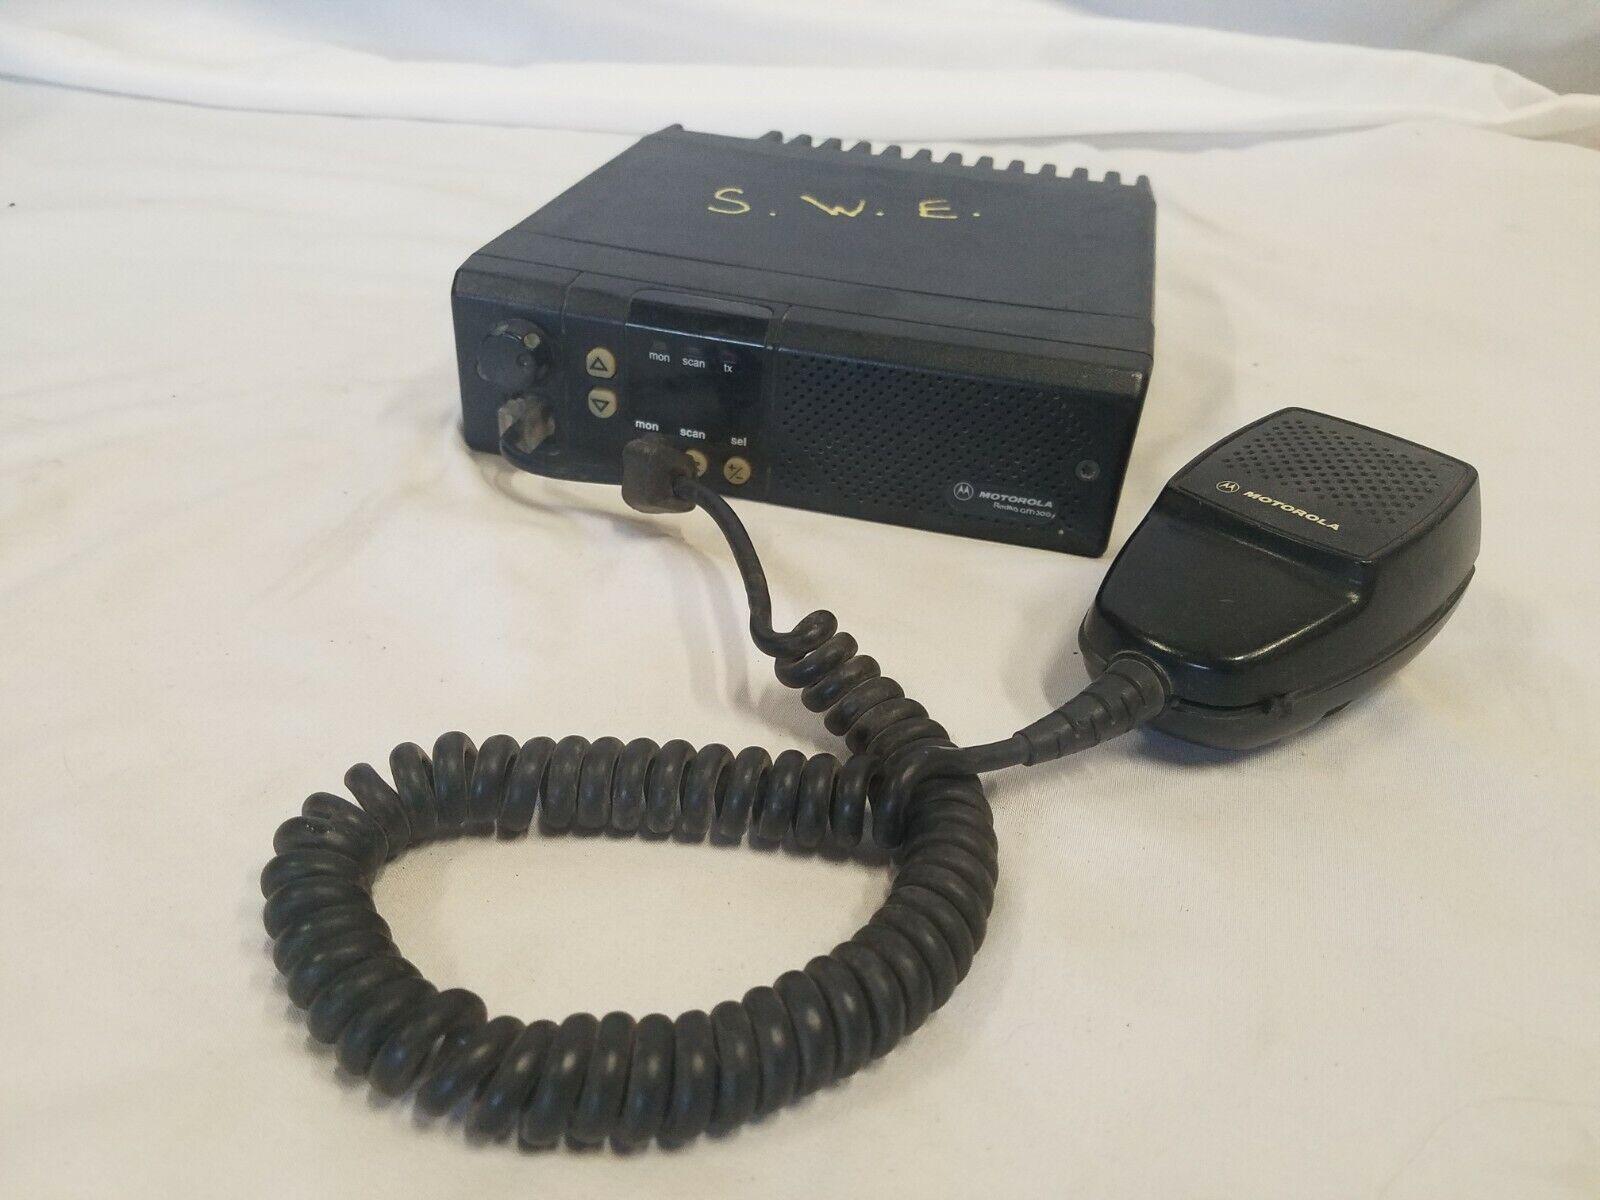 Motorola Radius GM300  M44GMC20D3AA. Buy it now for 99.99